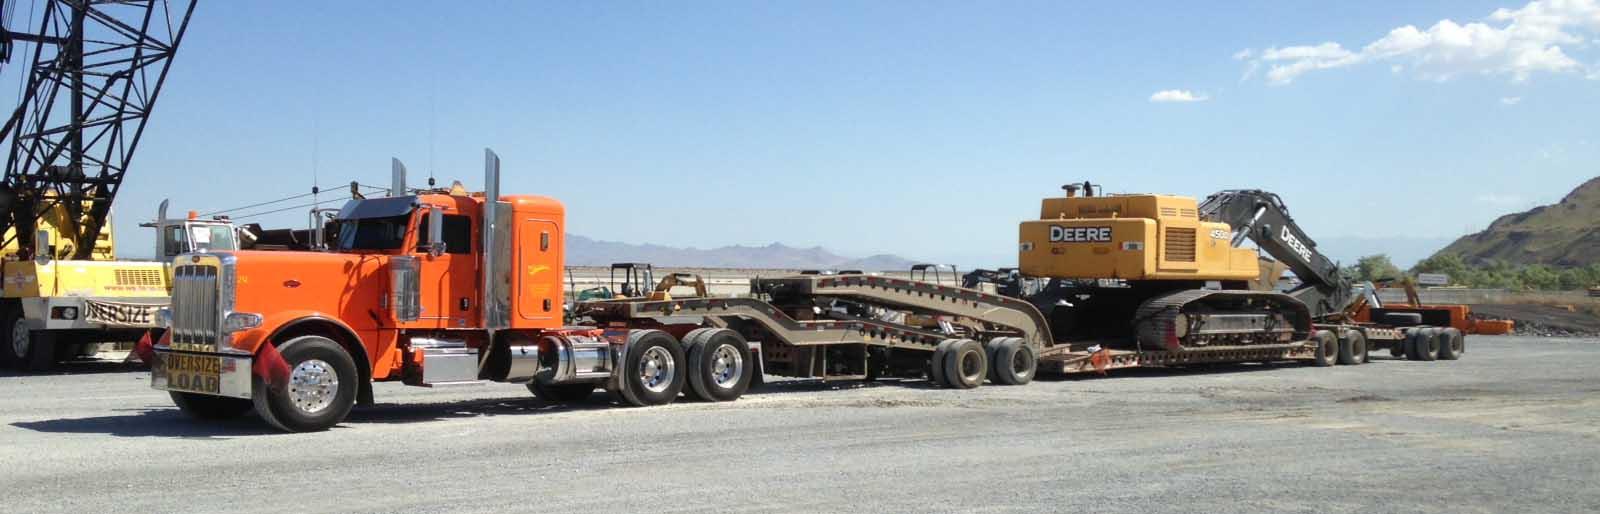 Heavy Equipment Transport Heavy Equipment Transport Quotes